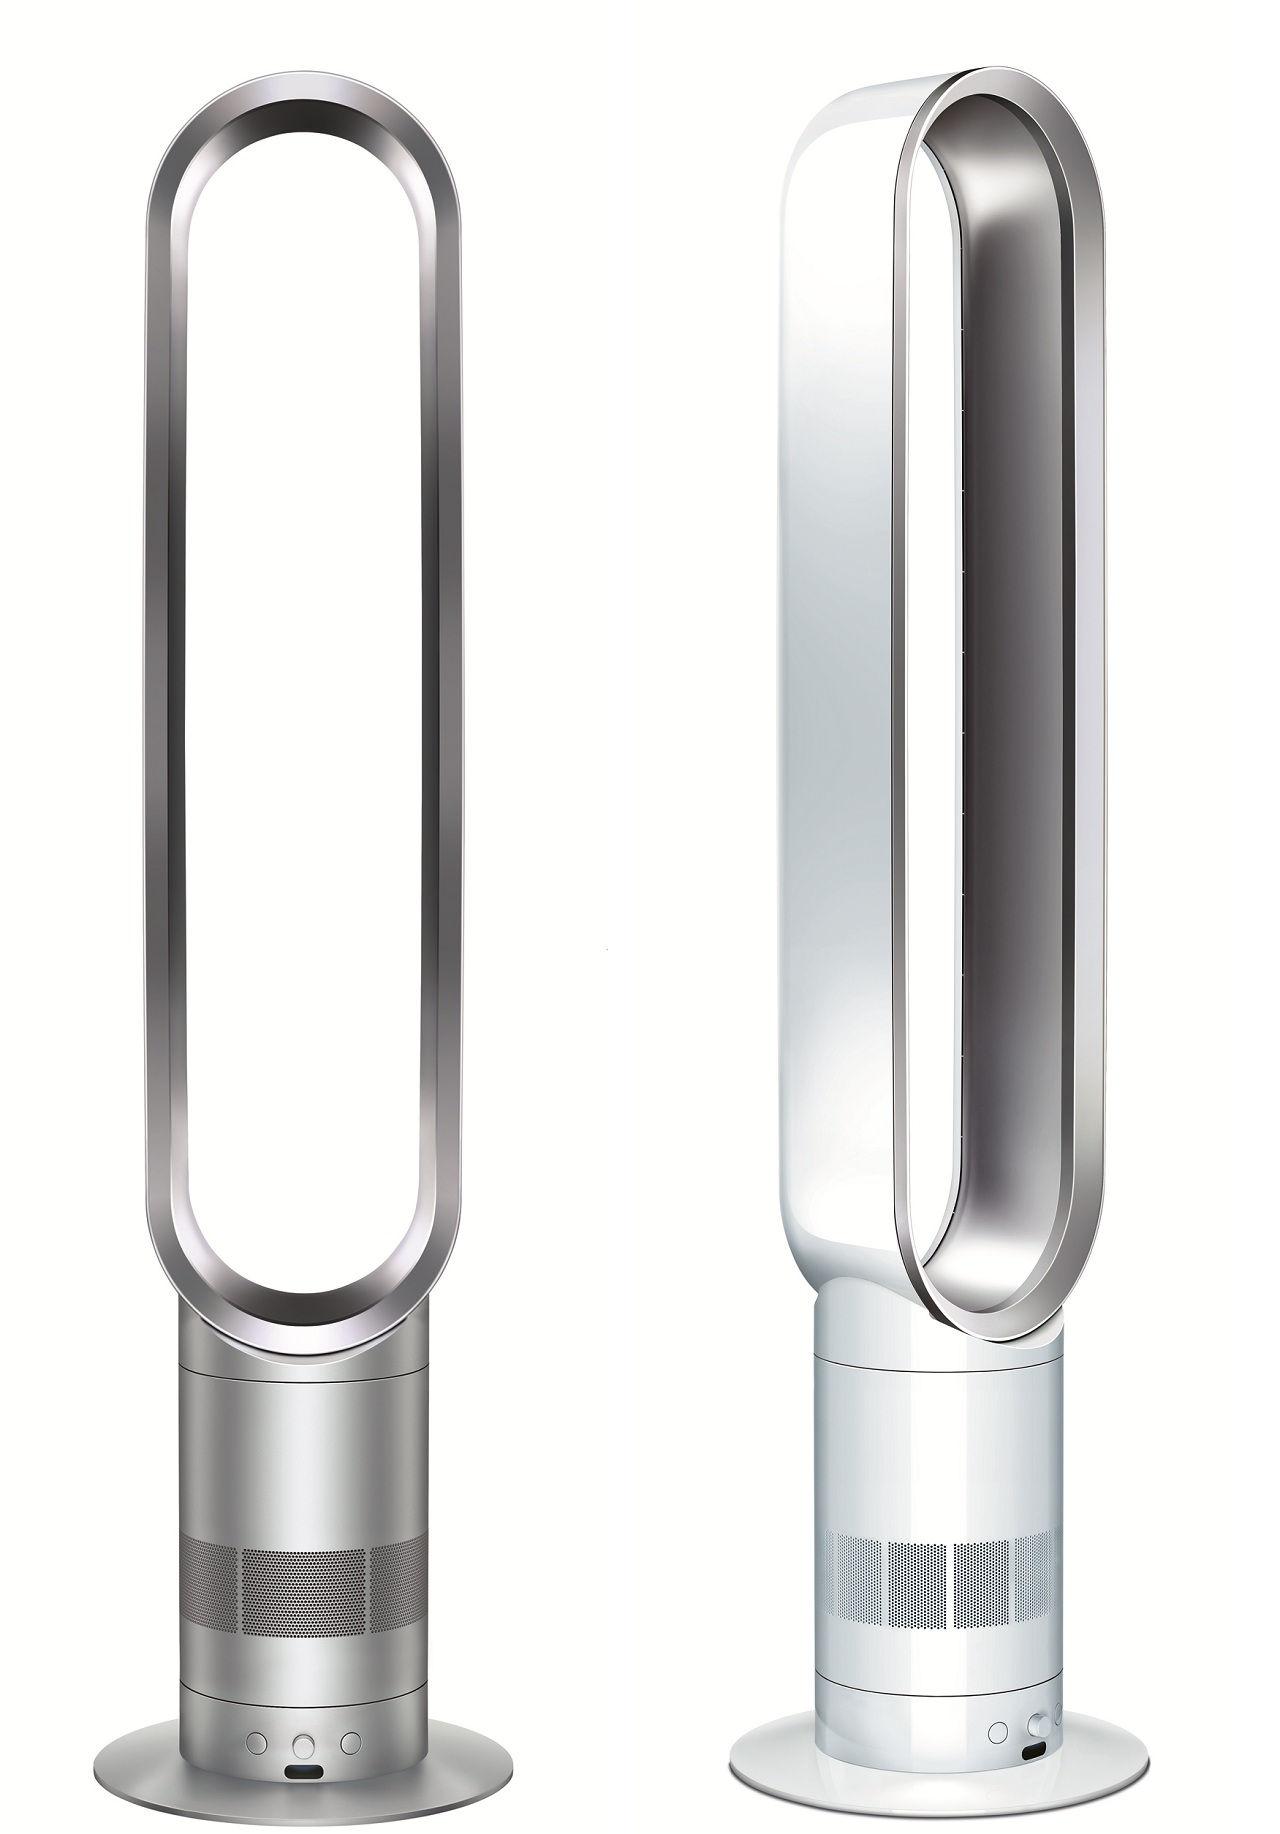 Dyson air multiplier как работает cleaning filters on a dyson